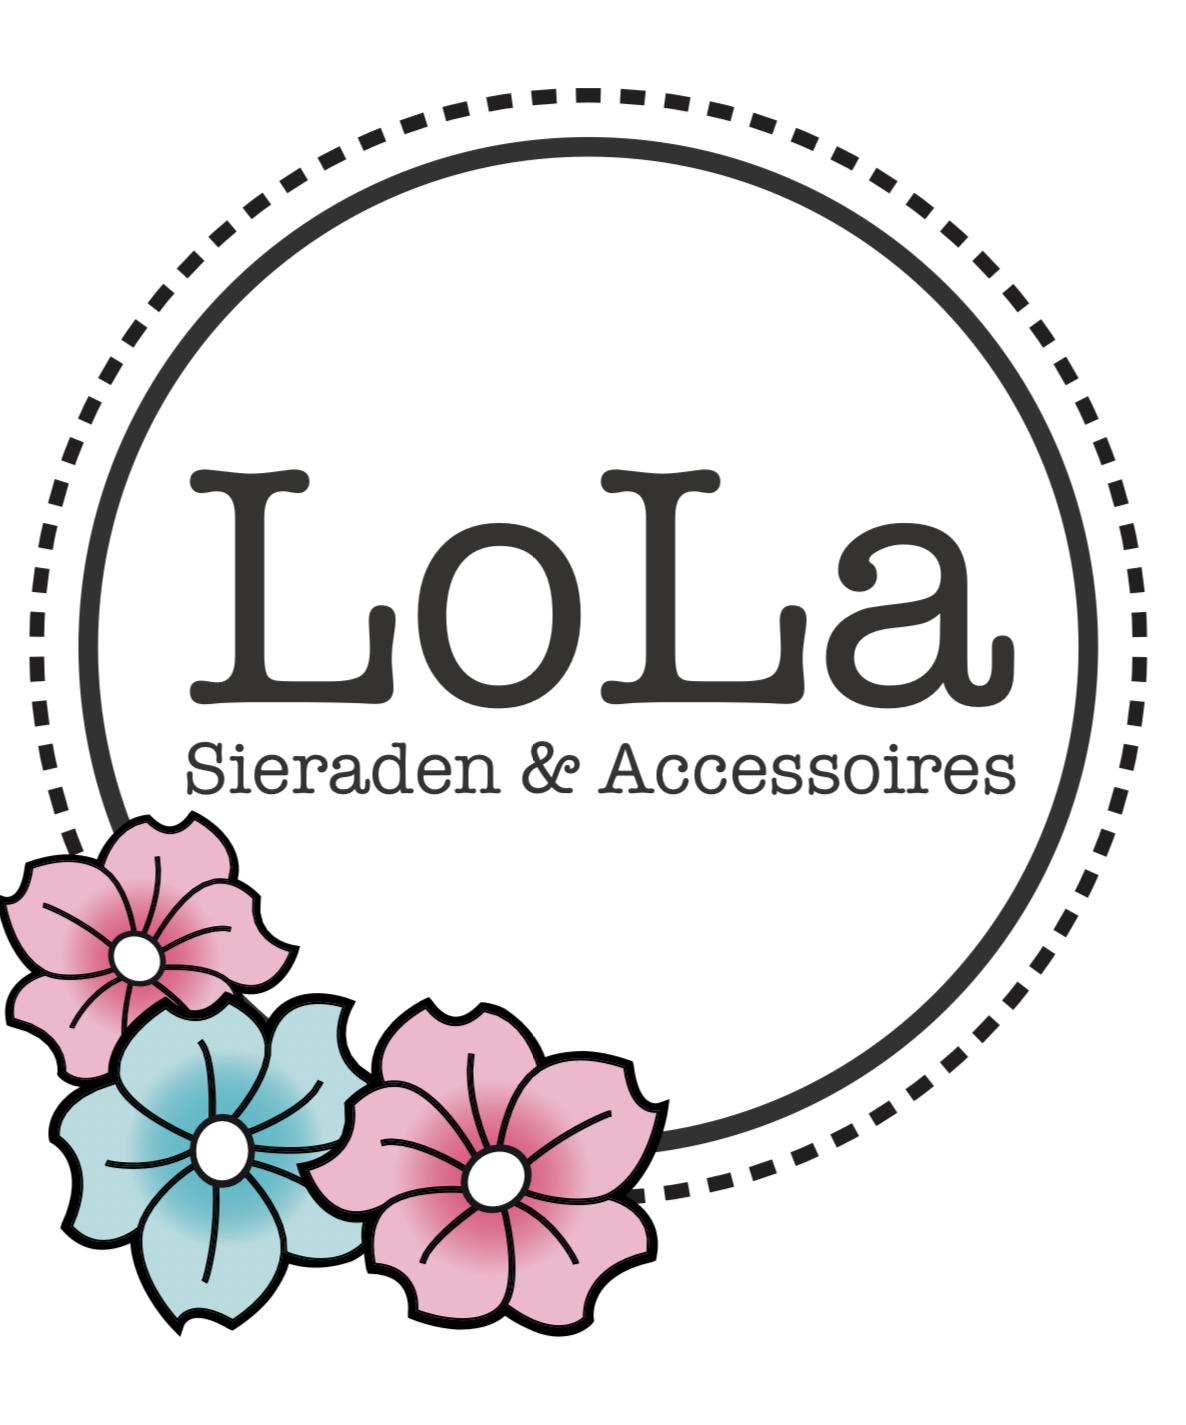 LoLa Sieraden & Accessoires